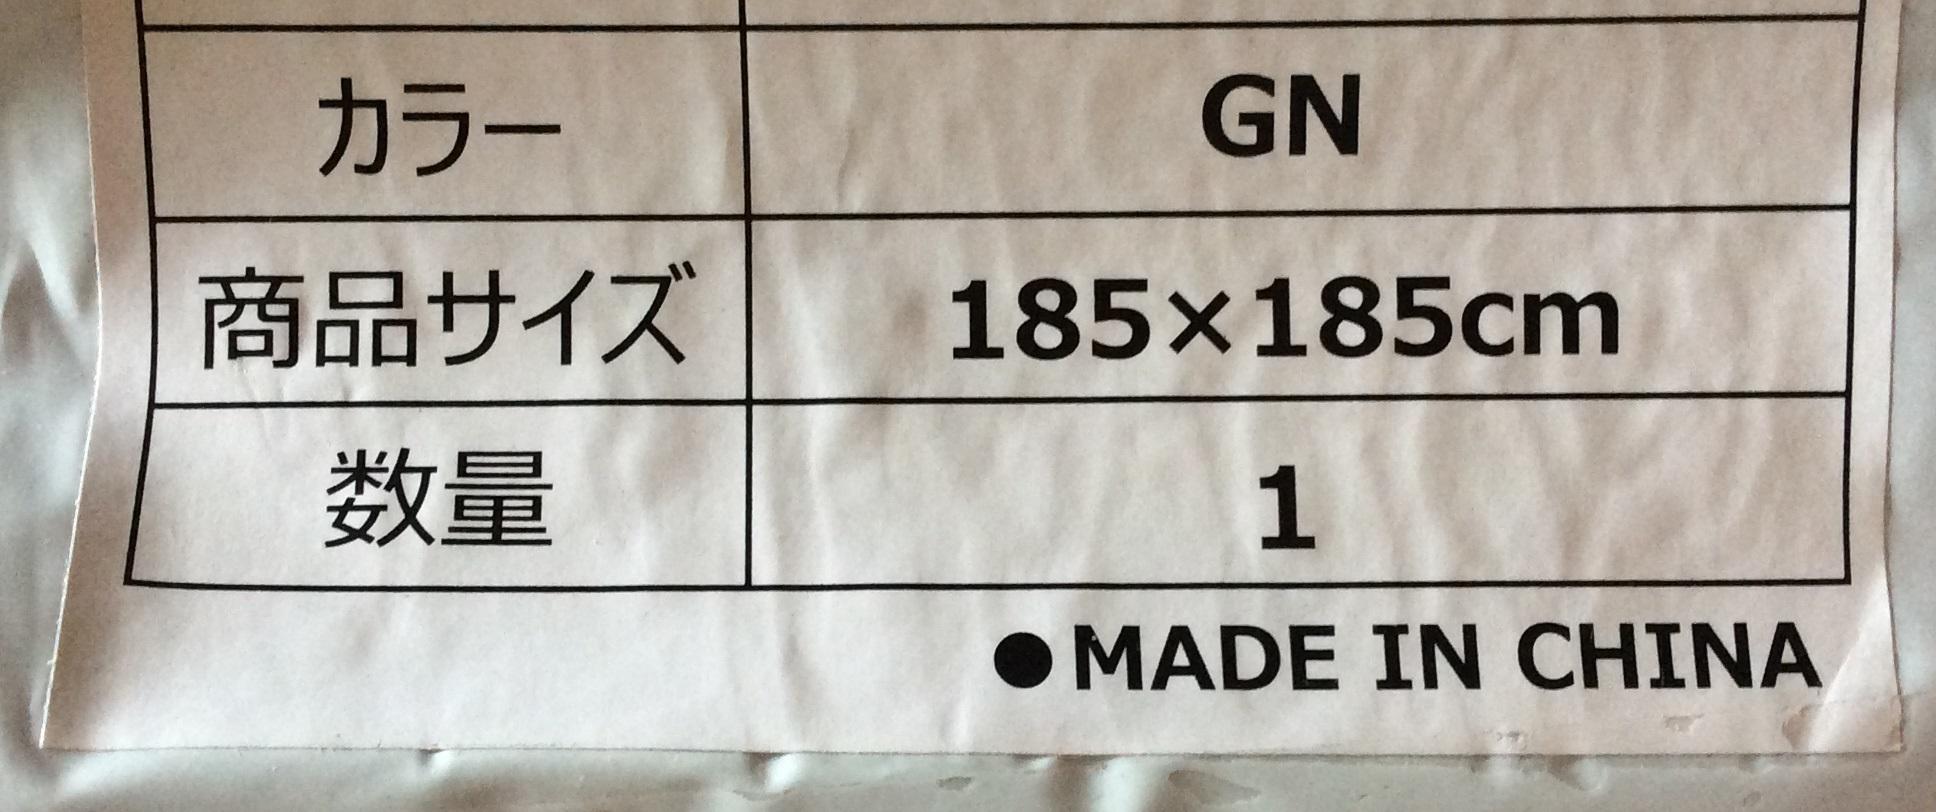 E5EBE3D2-EF19-4BBD-91FF-6558CF8372B9.jpeg